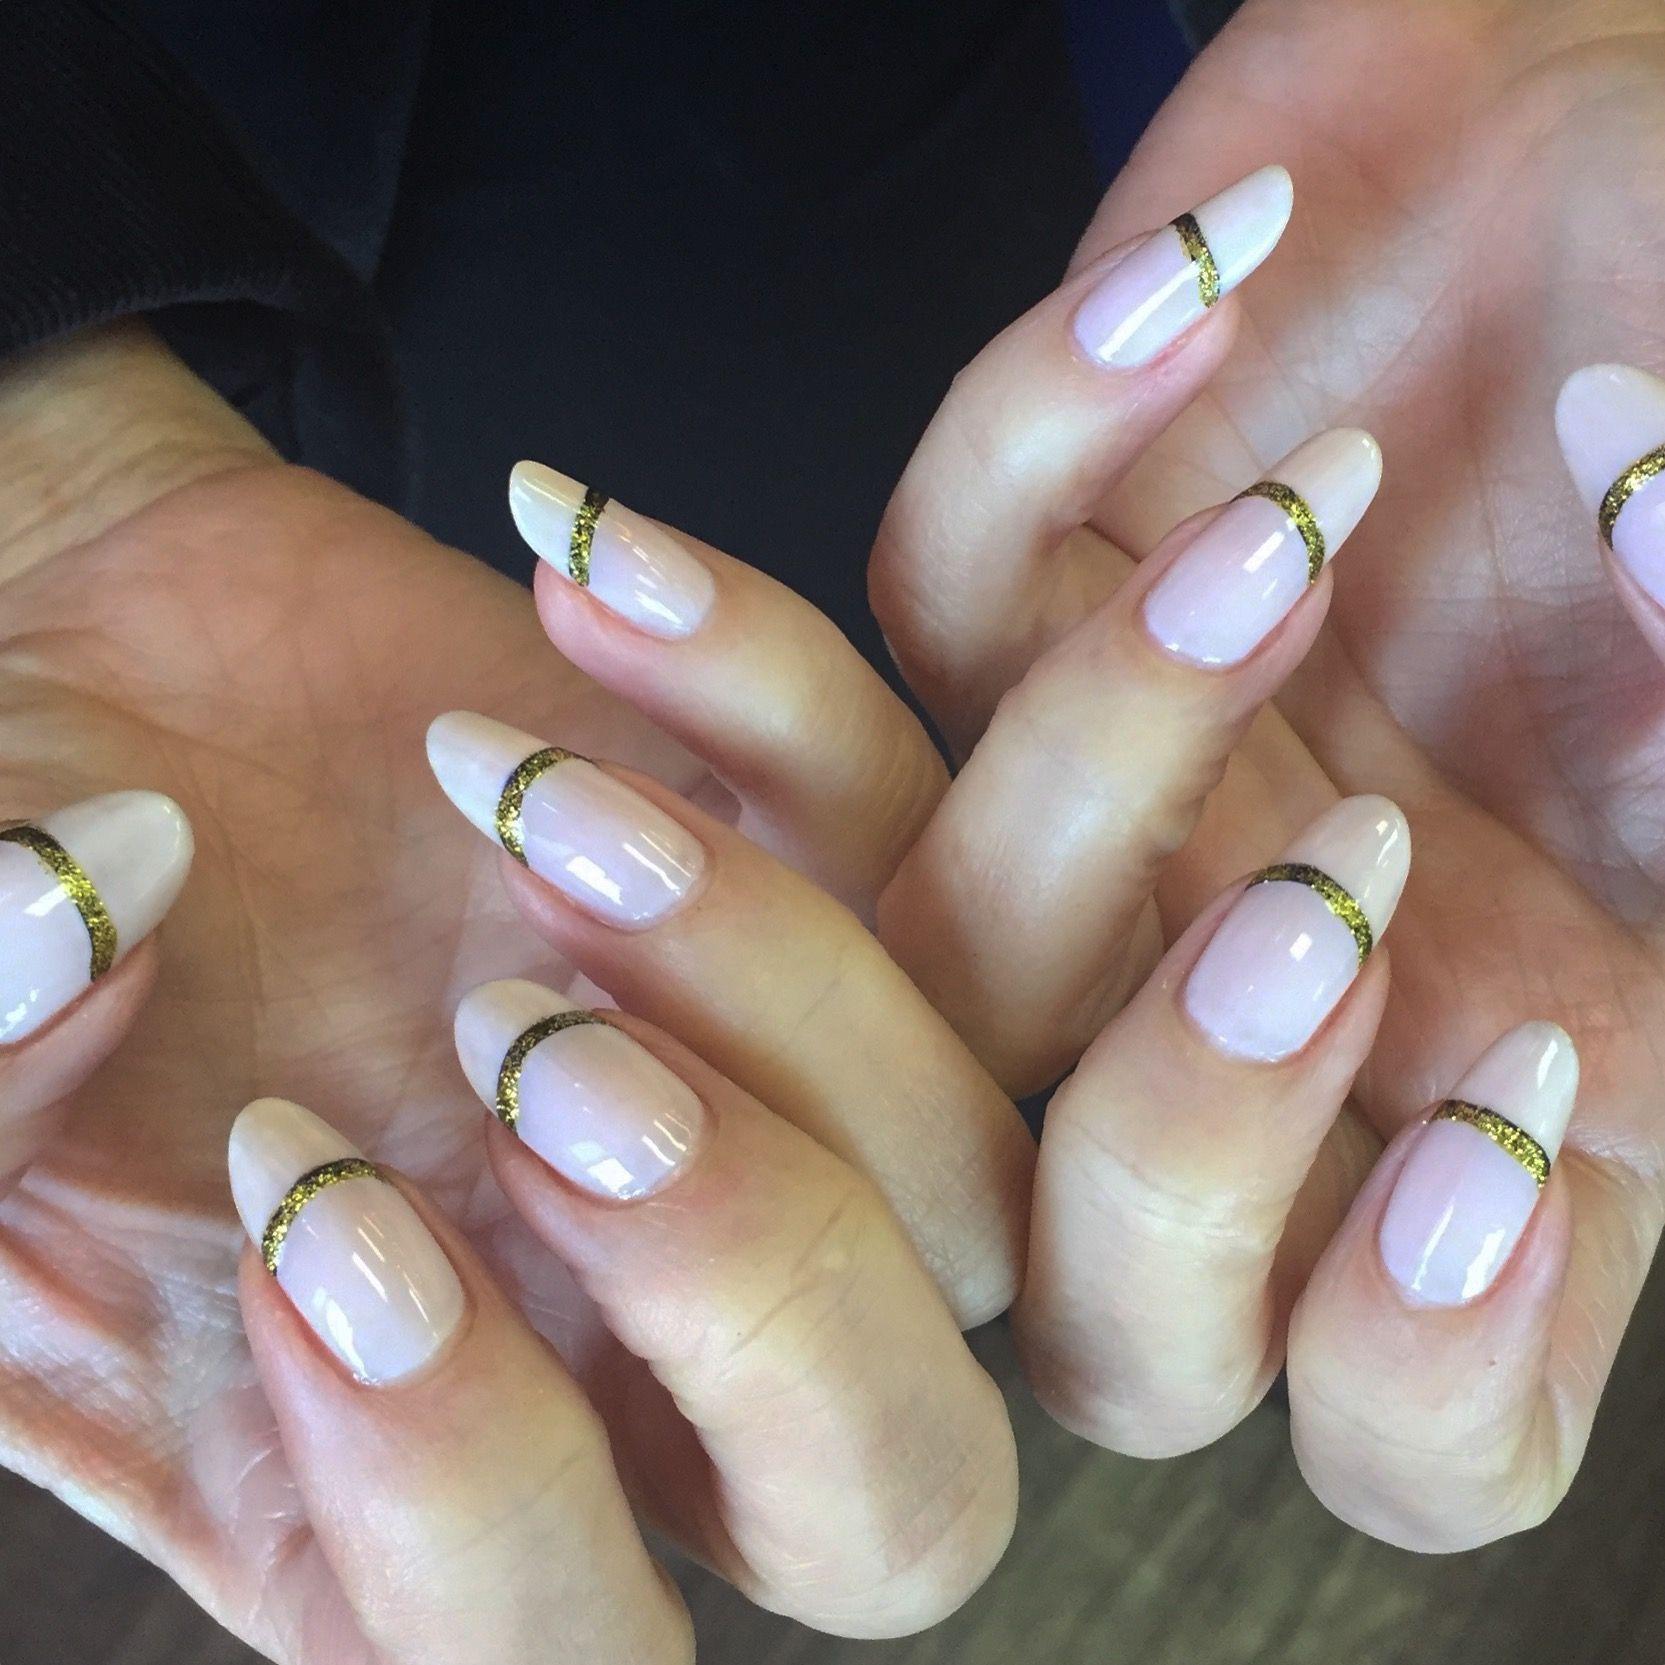 Natural nails -Beautiful Christmas French using life on Mars polish ...